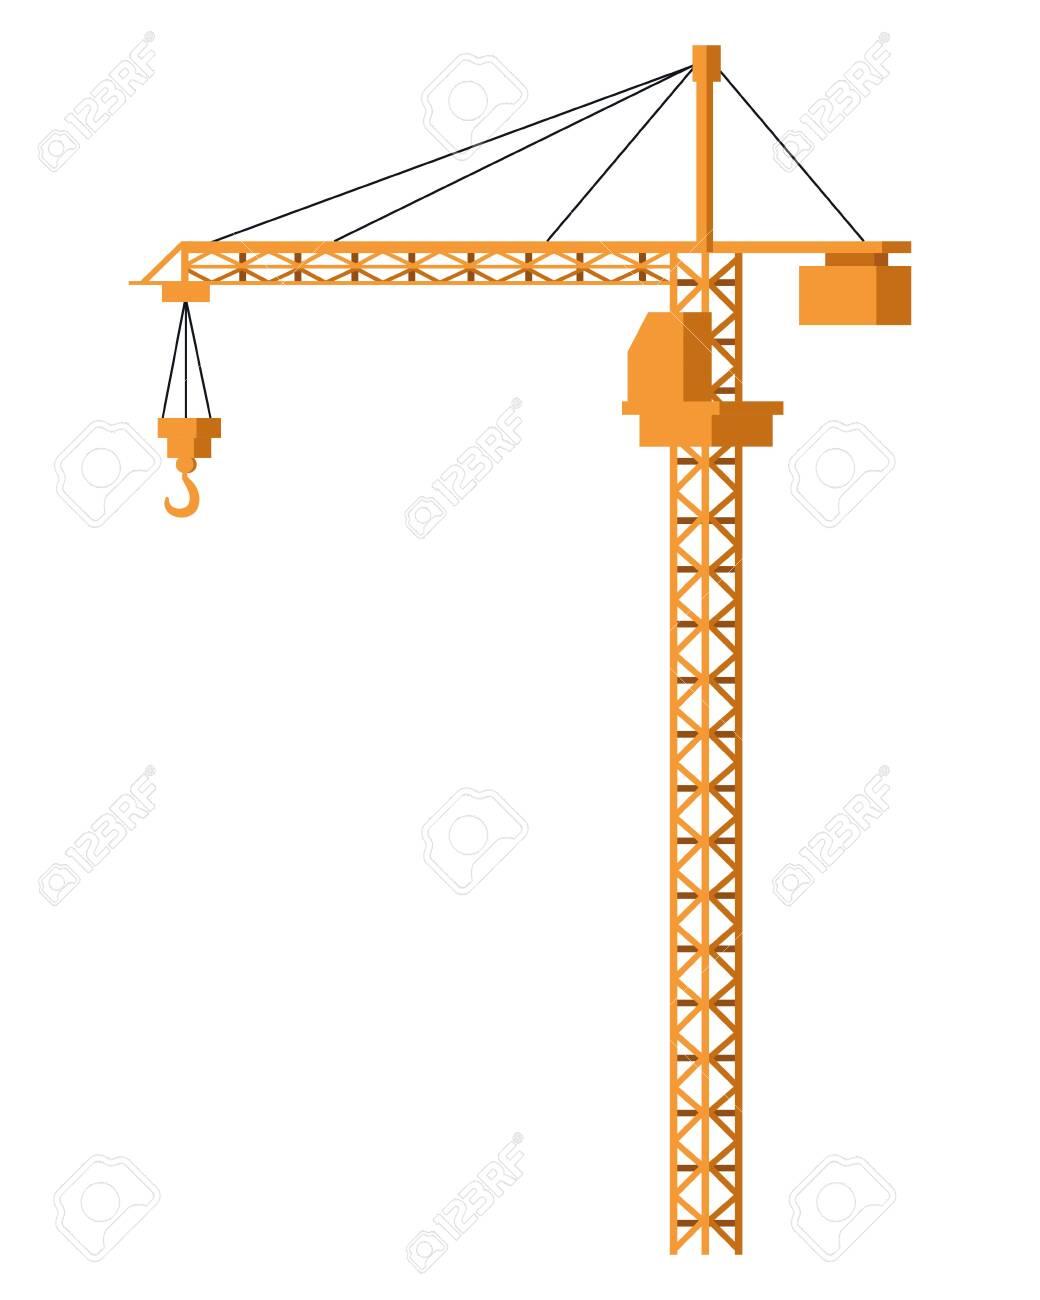 Cronstruction crane machinery isolated vector illustration graphic design - 122409992